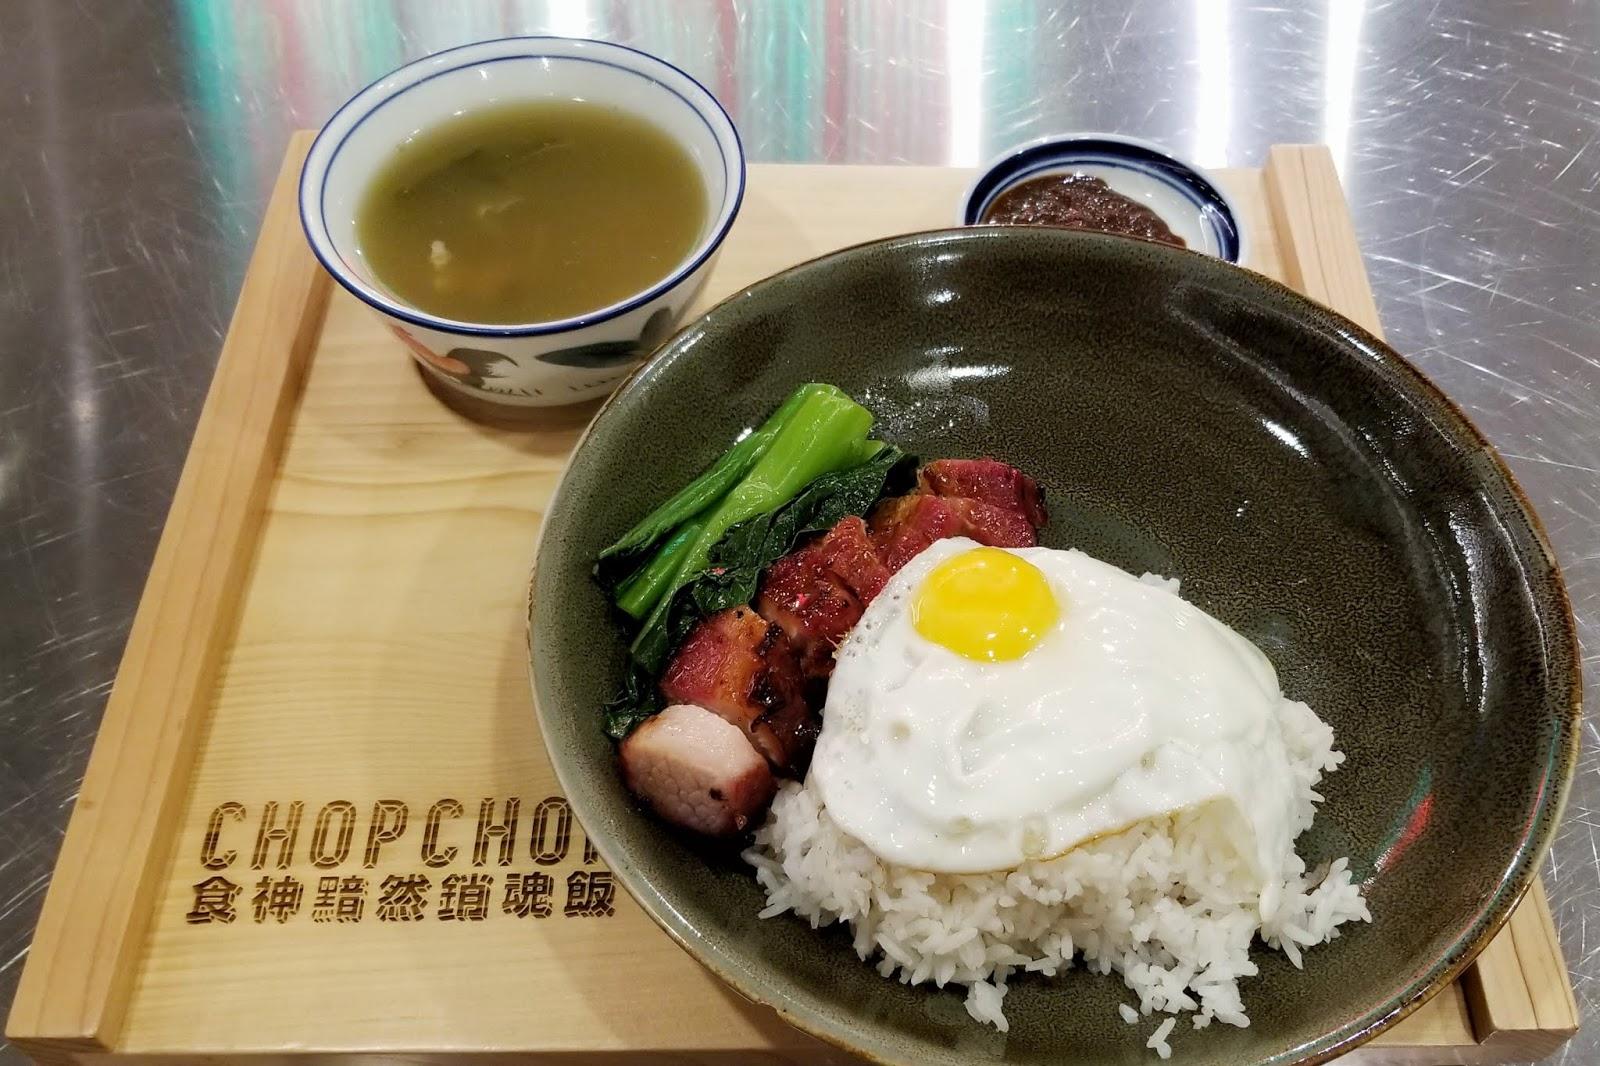 [Chop chop 食神叉燒] 新店踩線.黯然銷魂飯 | 非常食樂主義 Chikpi's EatEatShare